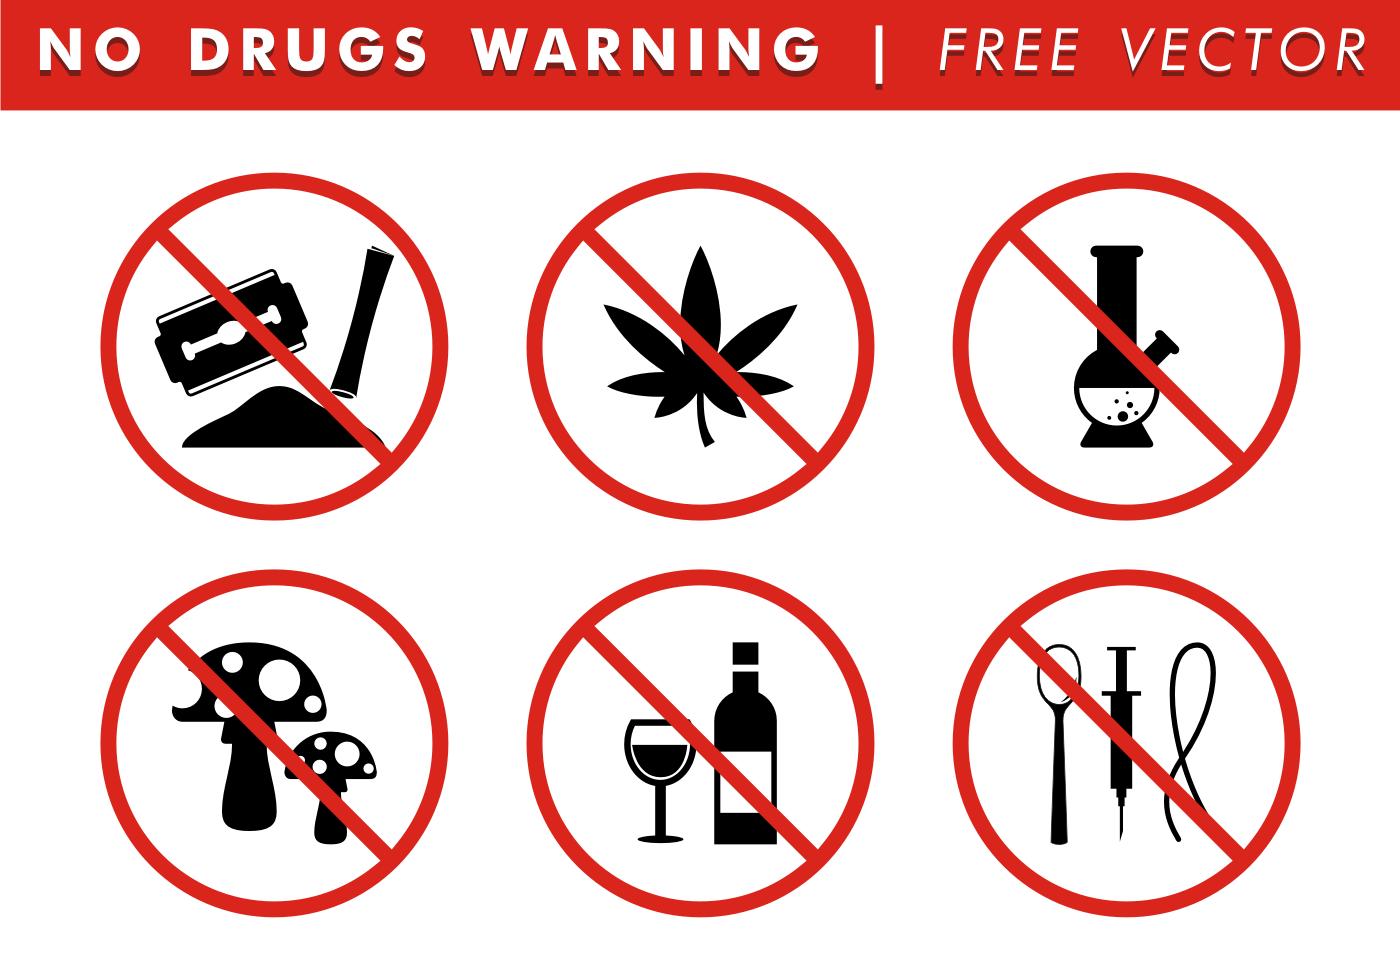 No Drugs Warning Free Vector